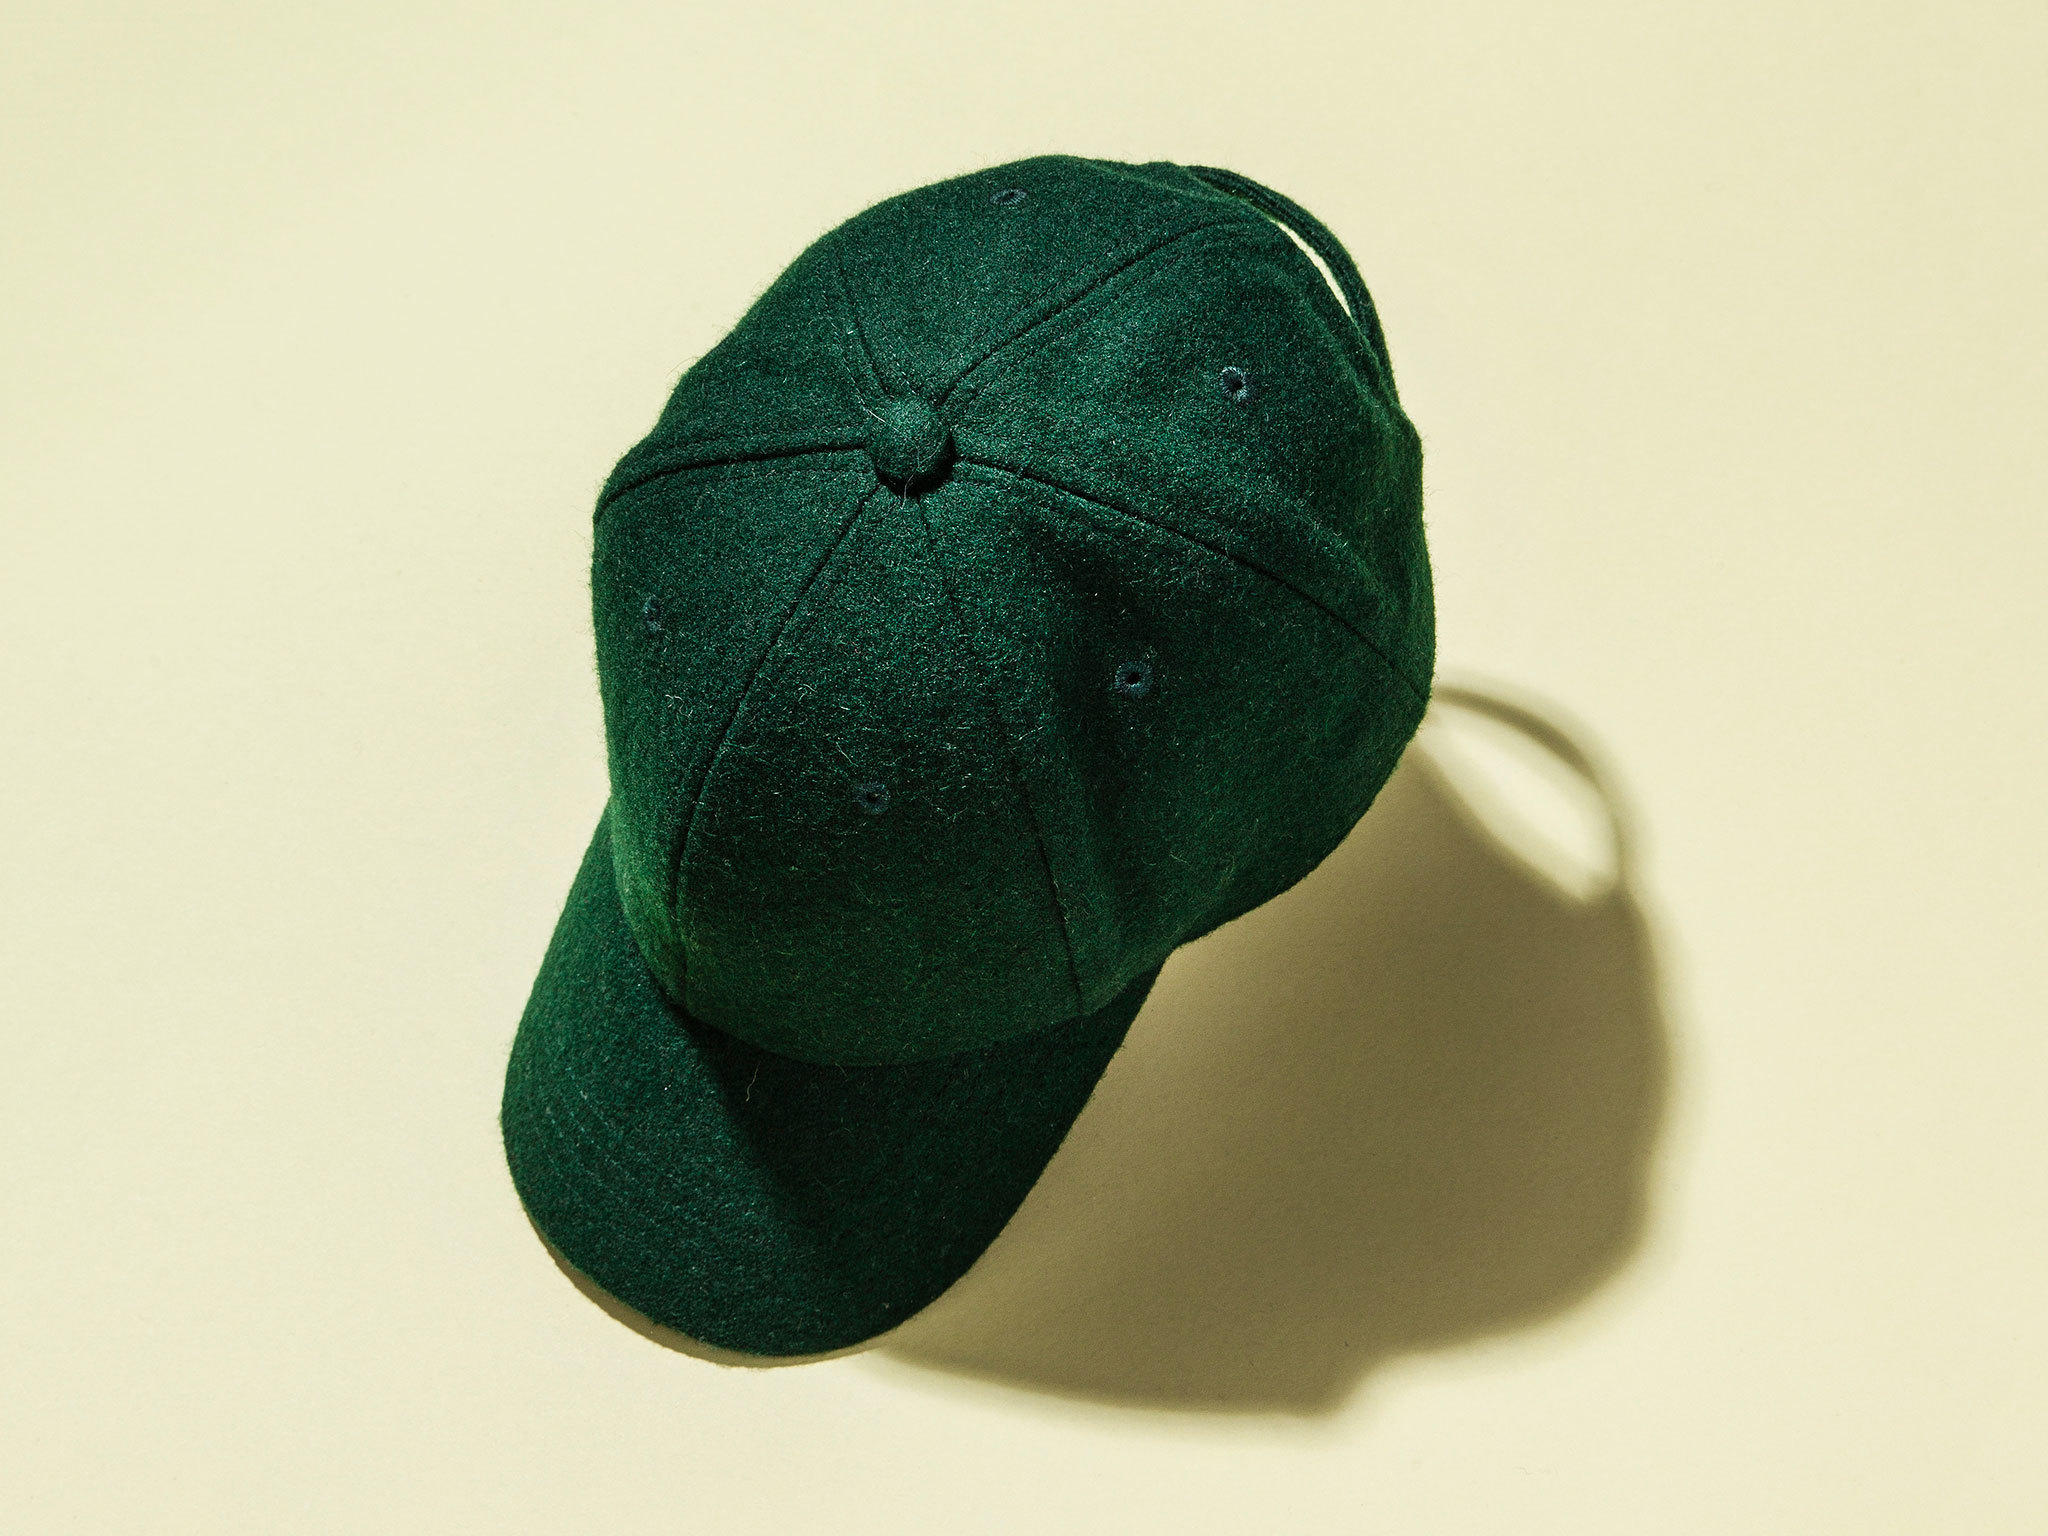 Felt baseball cap by Whistles